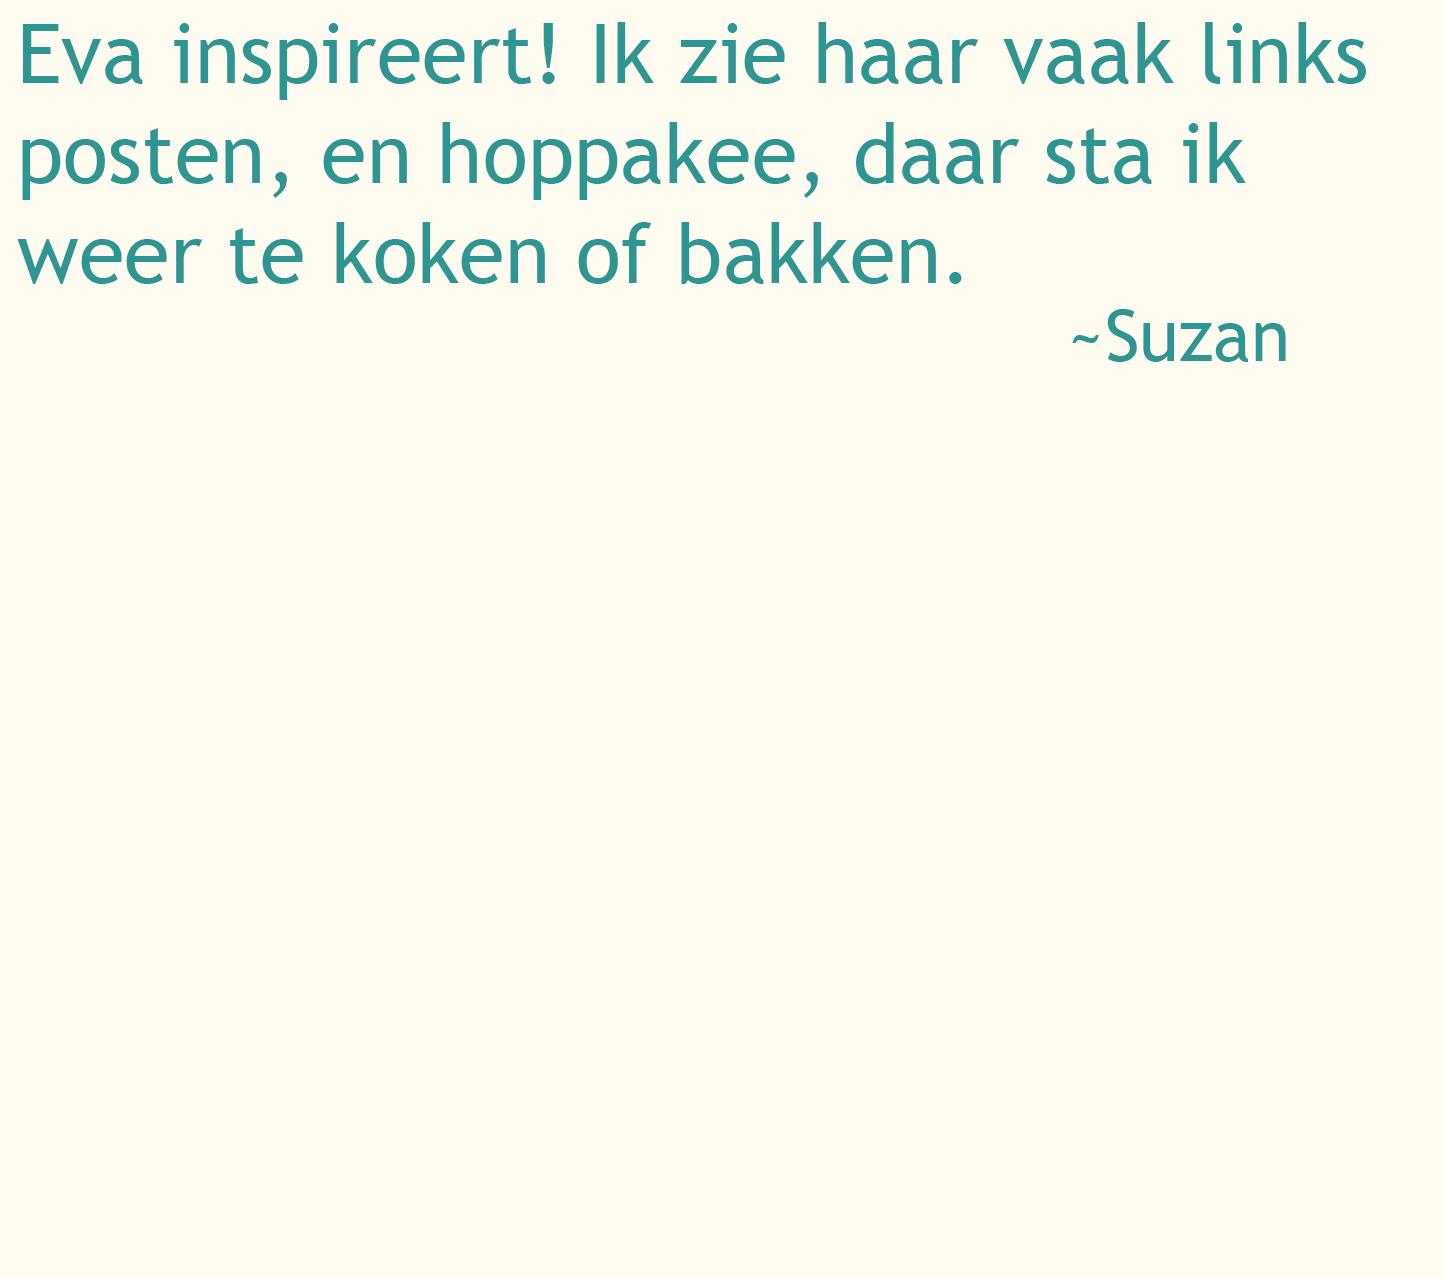 Suzan.png